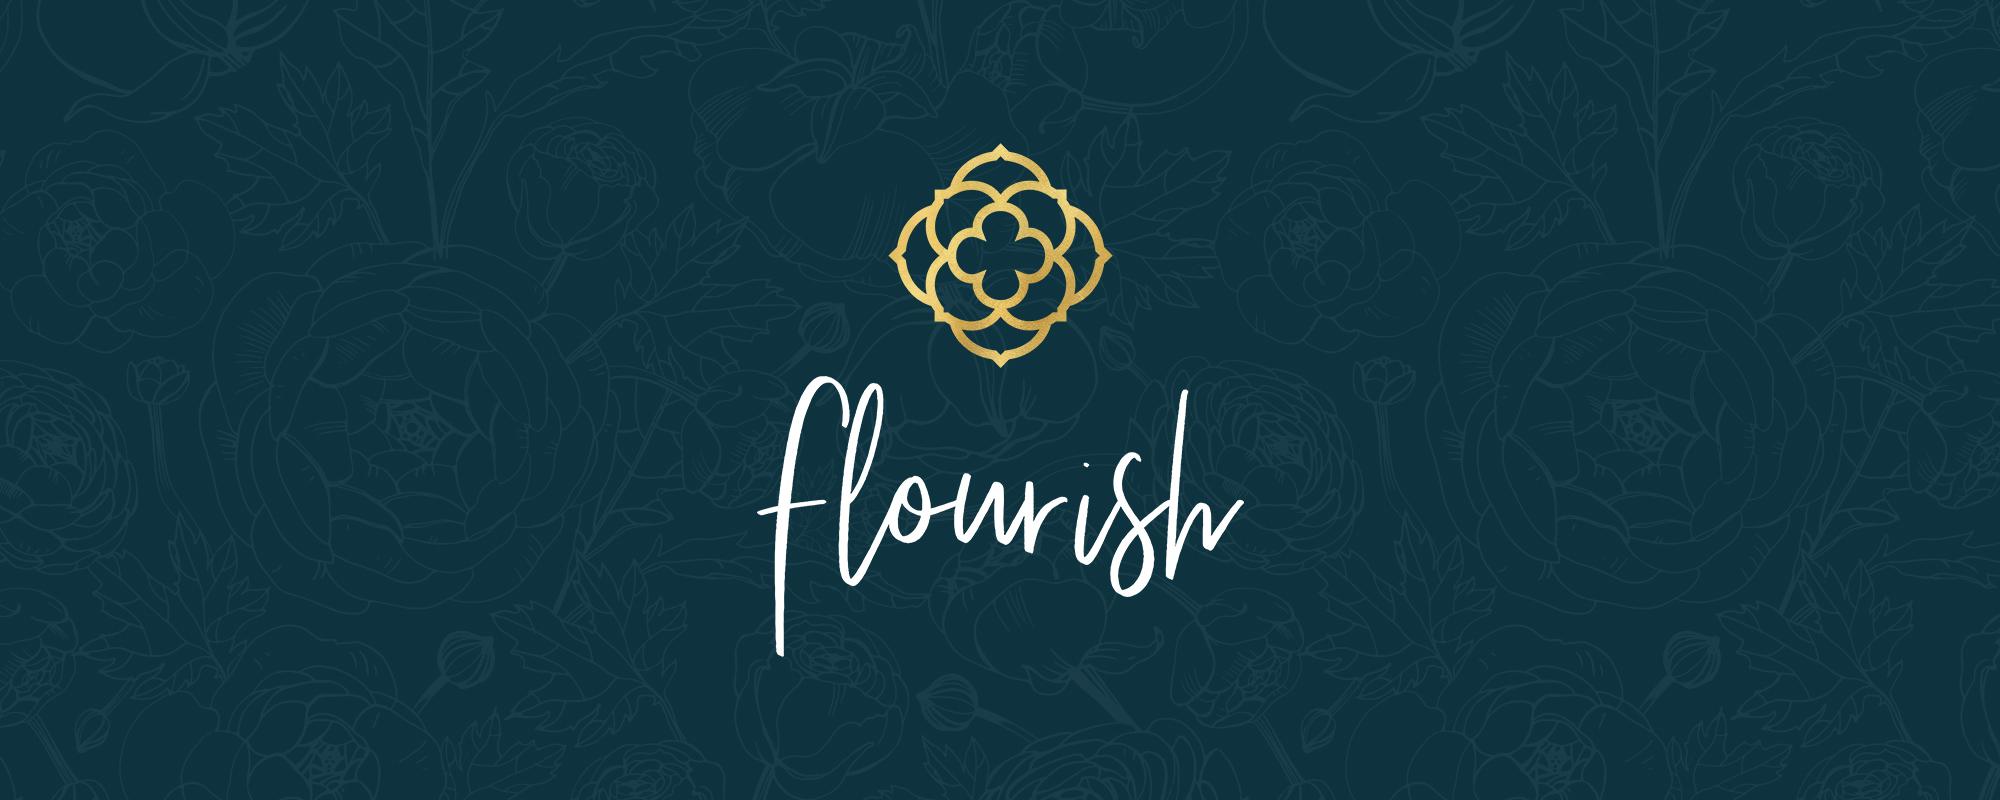 FlourishBoston-BrandIdentityDesign.jpg